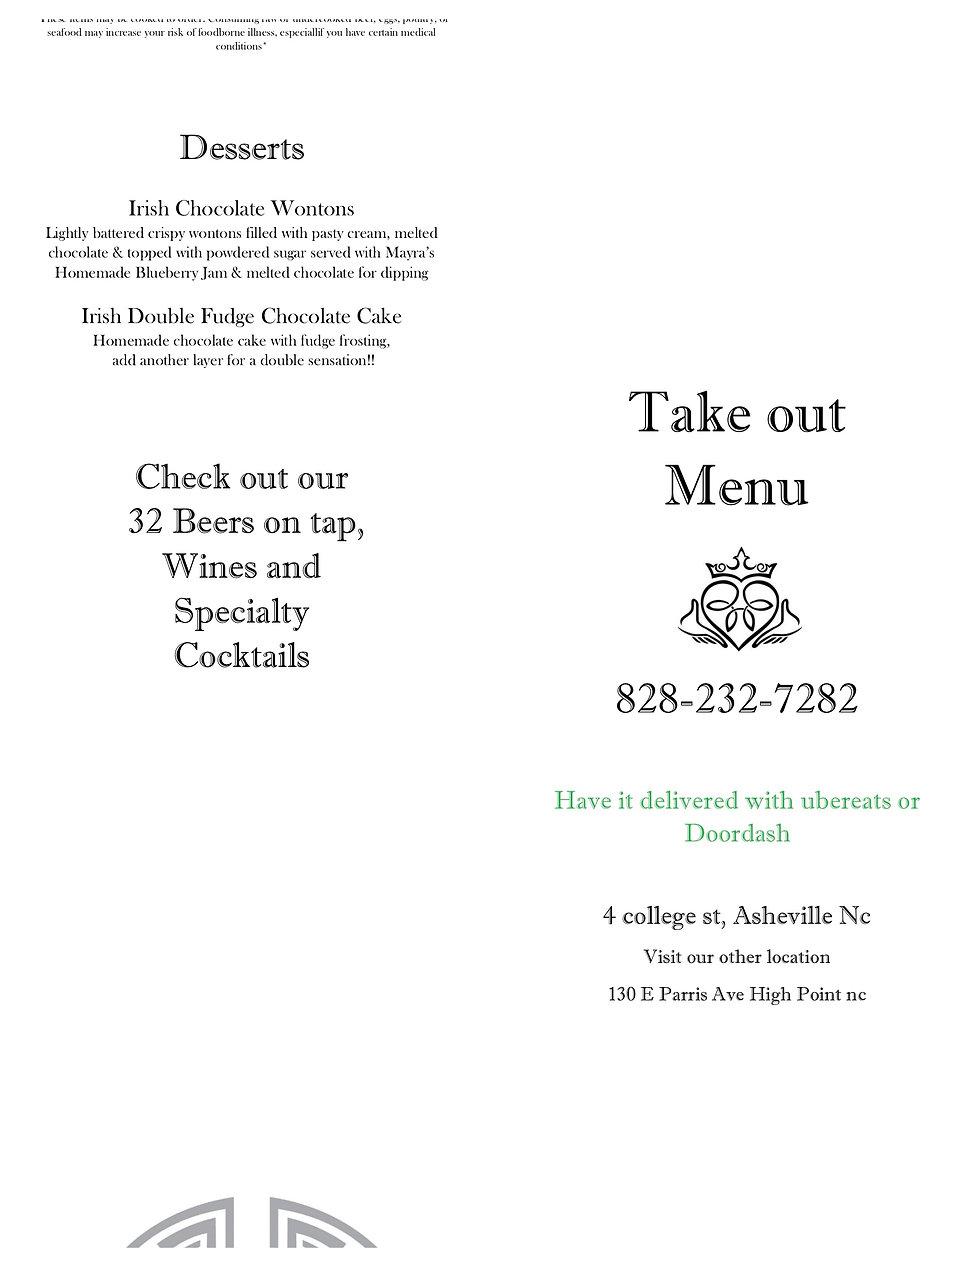 Asheville to go menu2.jpg